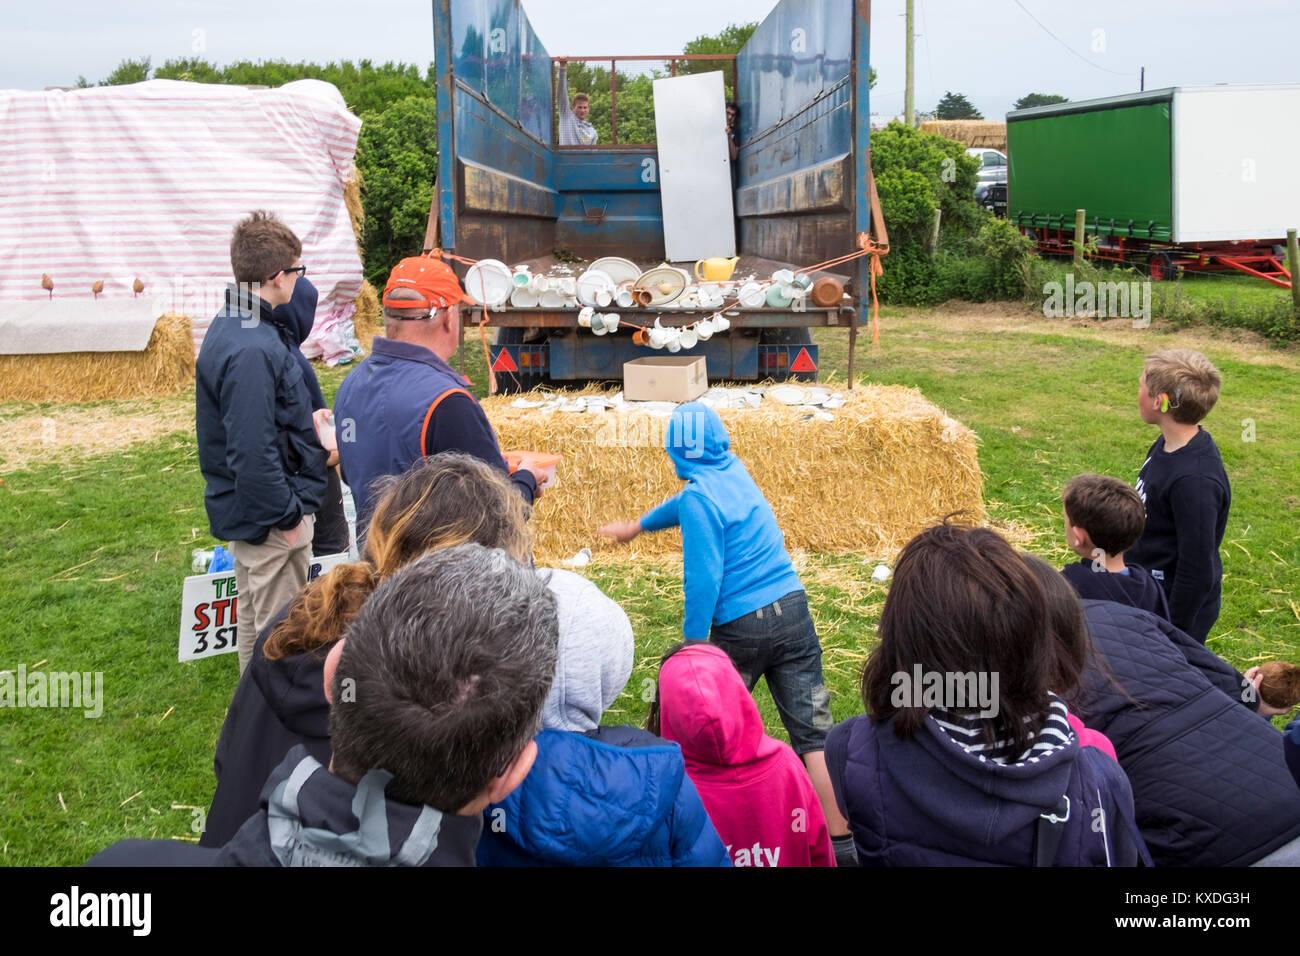 Prawle Fair, a traditional village fete in South devon, UK - Stock Image